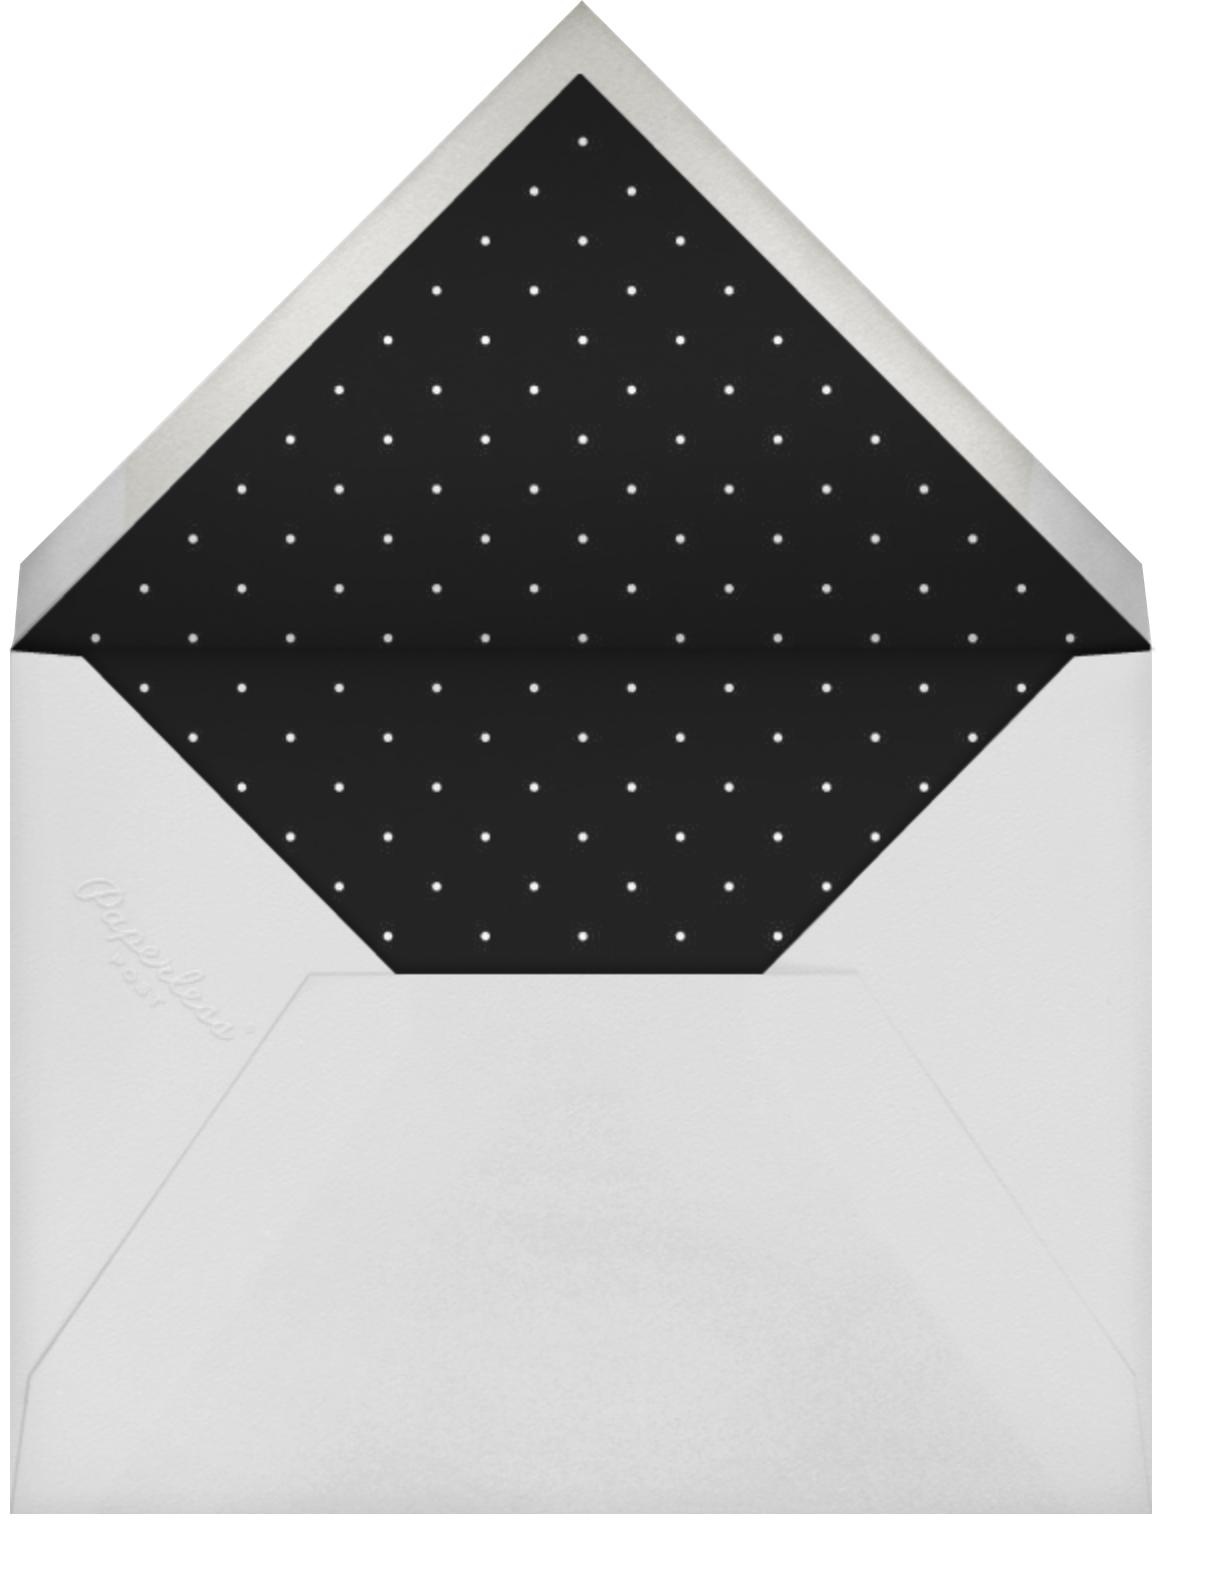 Quad - Ivory - Paperless Post - Kids' birthday - envelope back